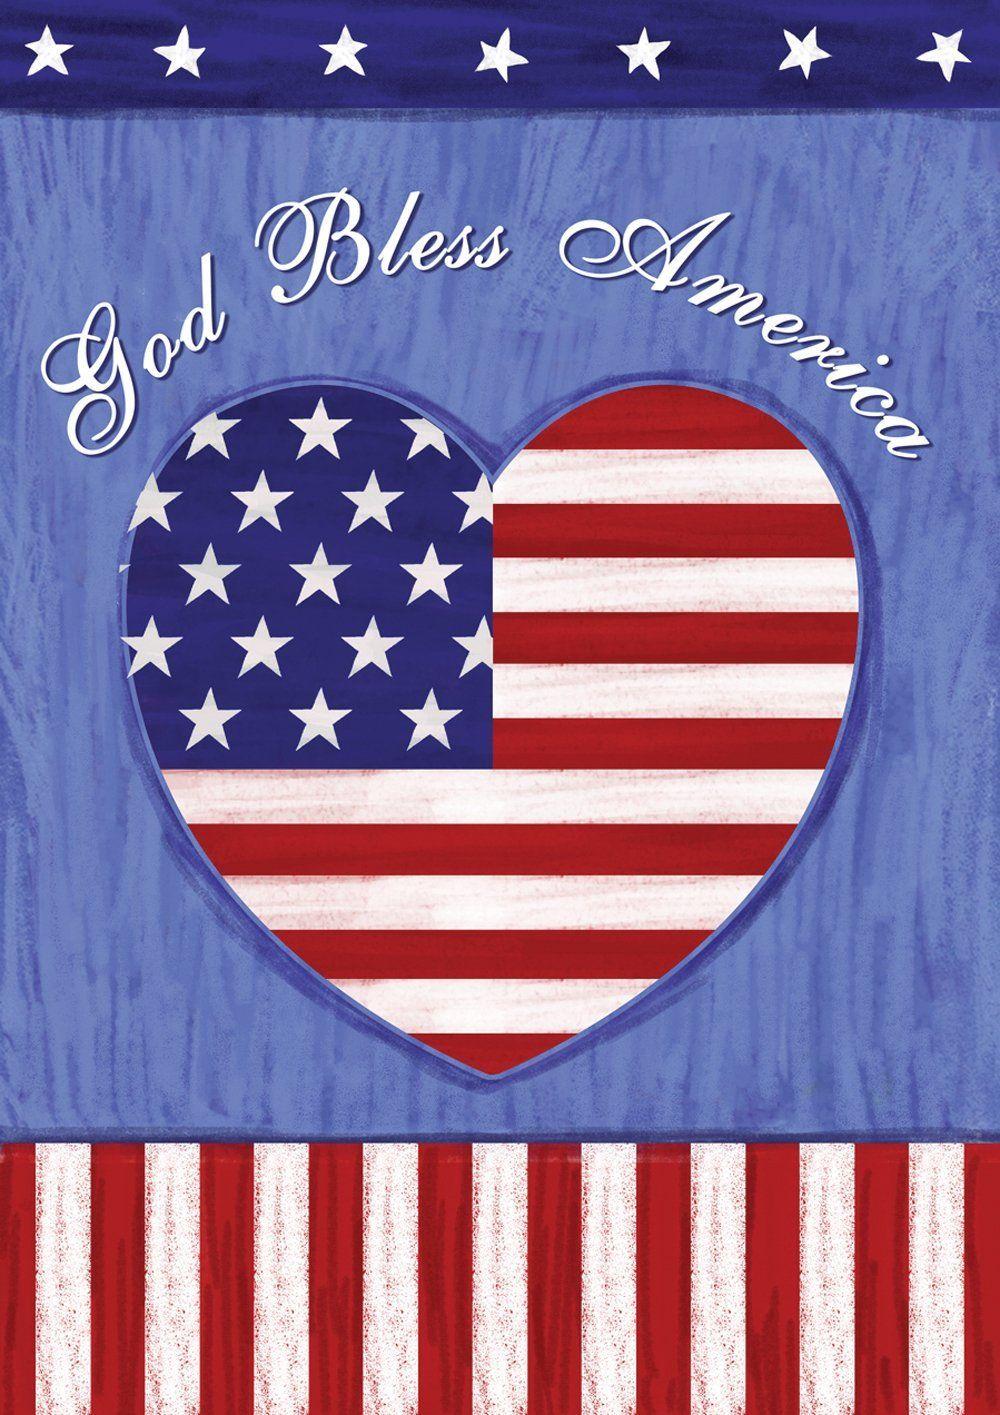 God Bless America Patriotic Garden Flag House Flags Flag